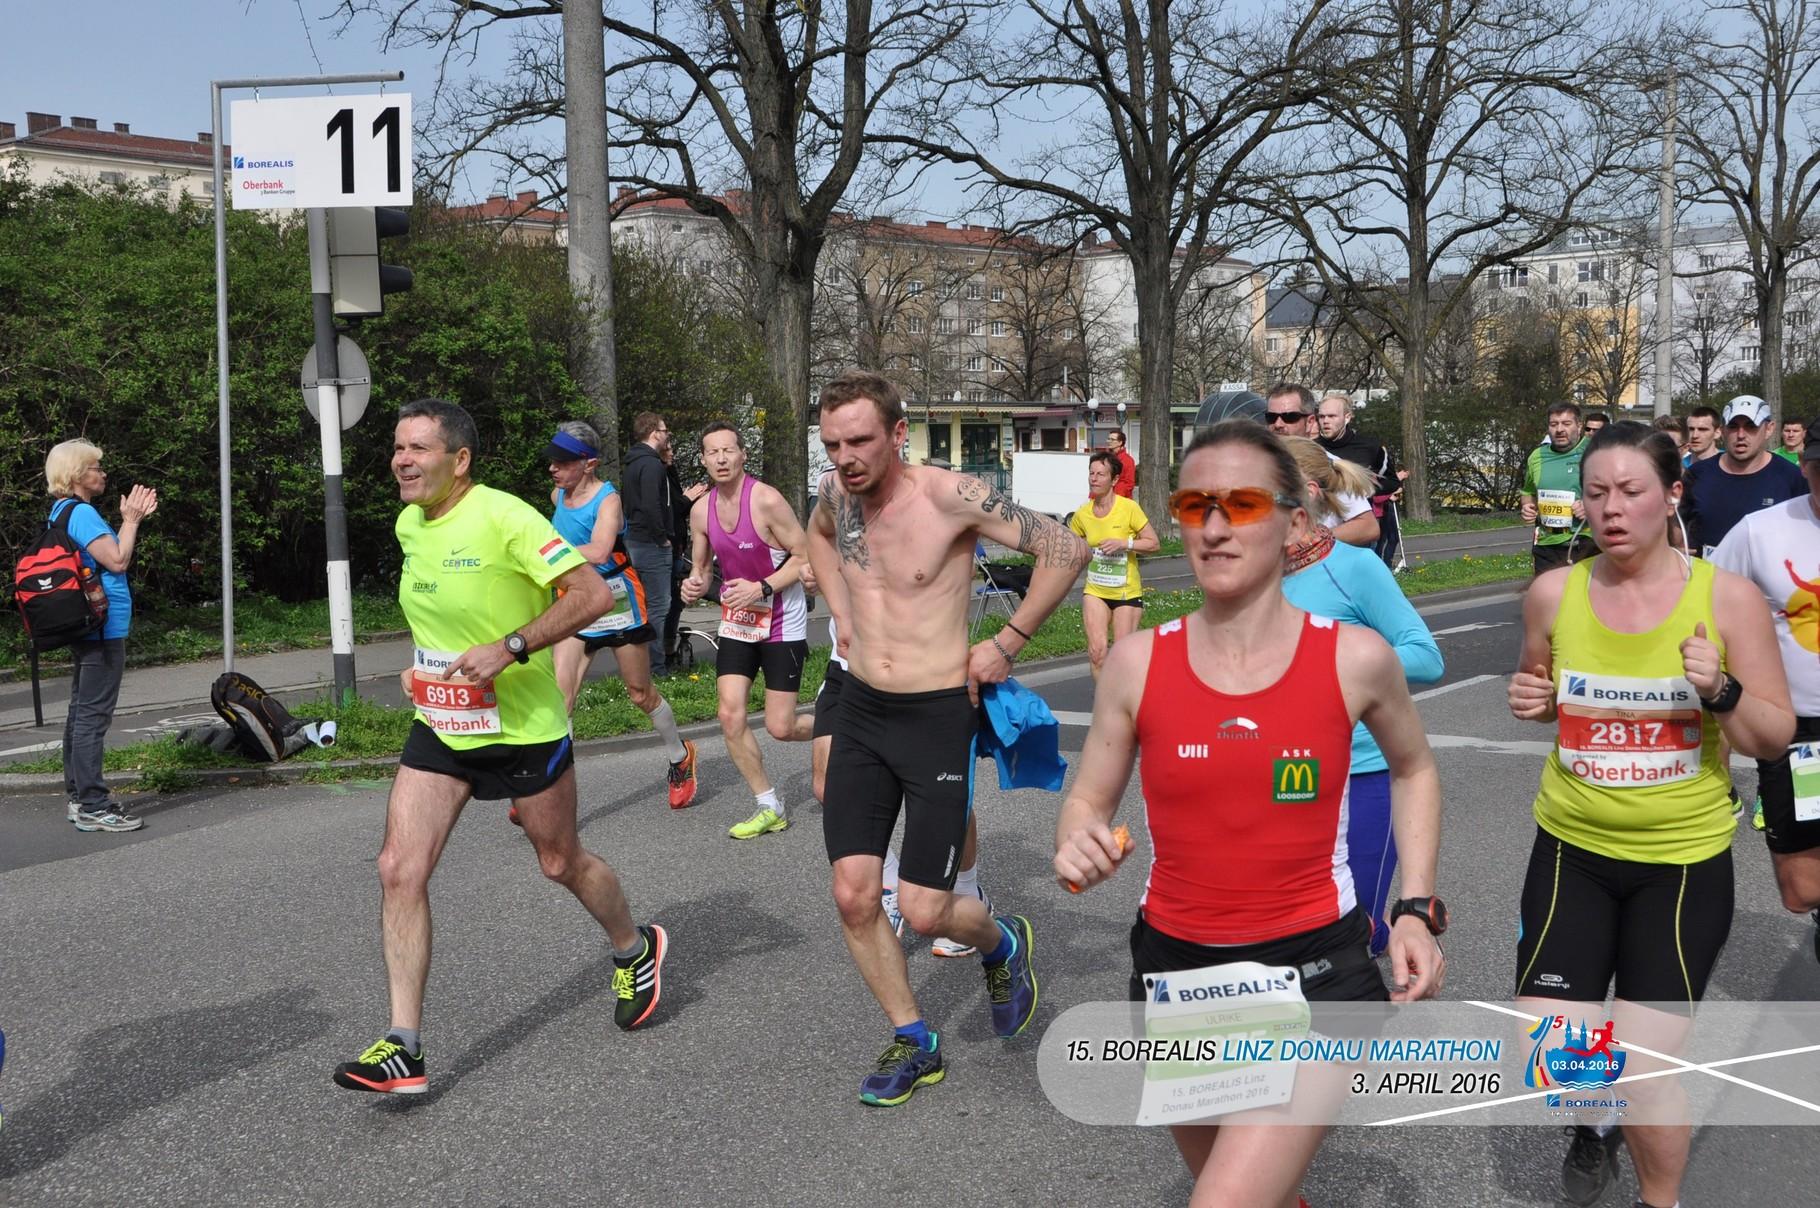 Ulli unsere Marathonfrau